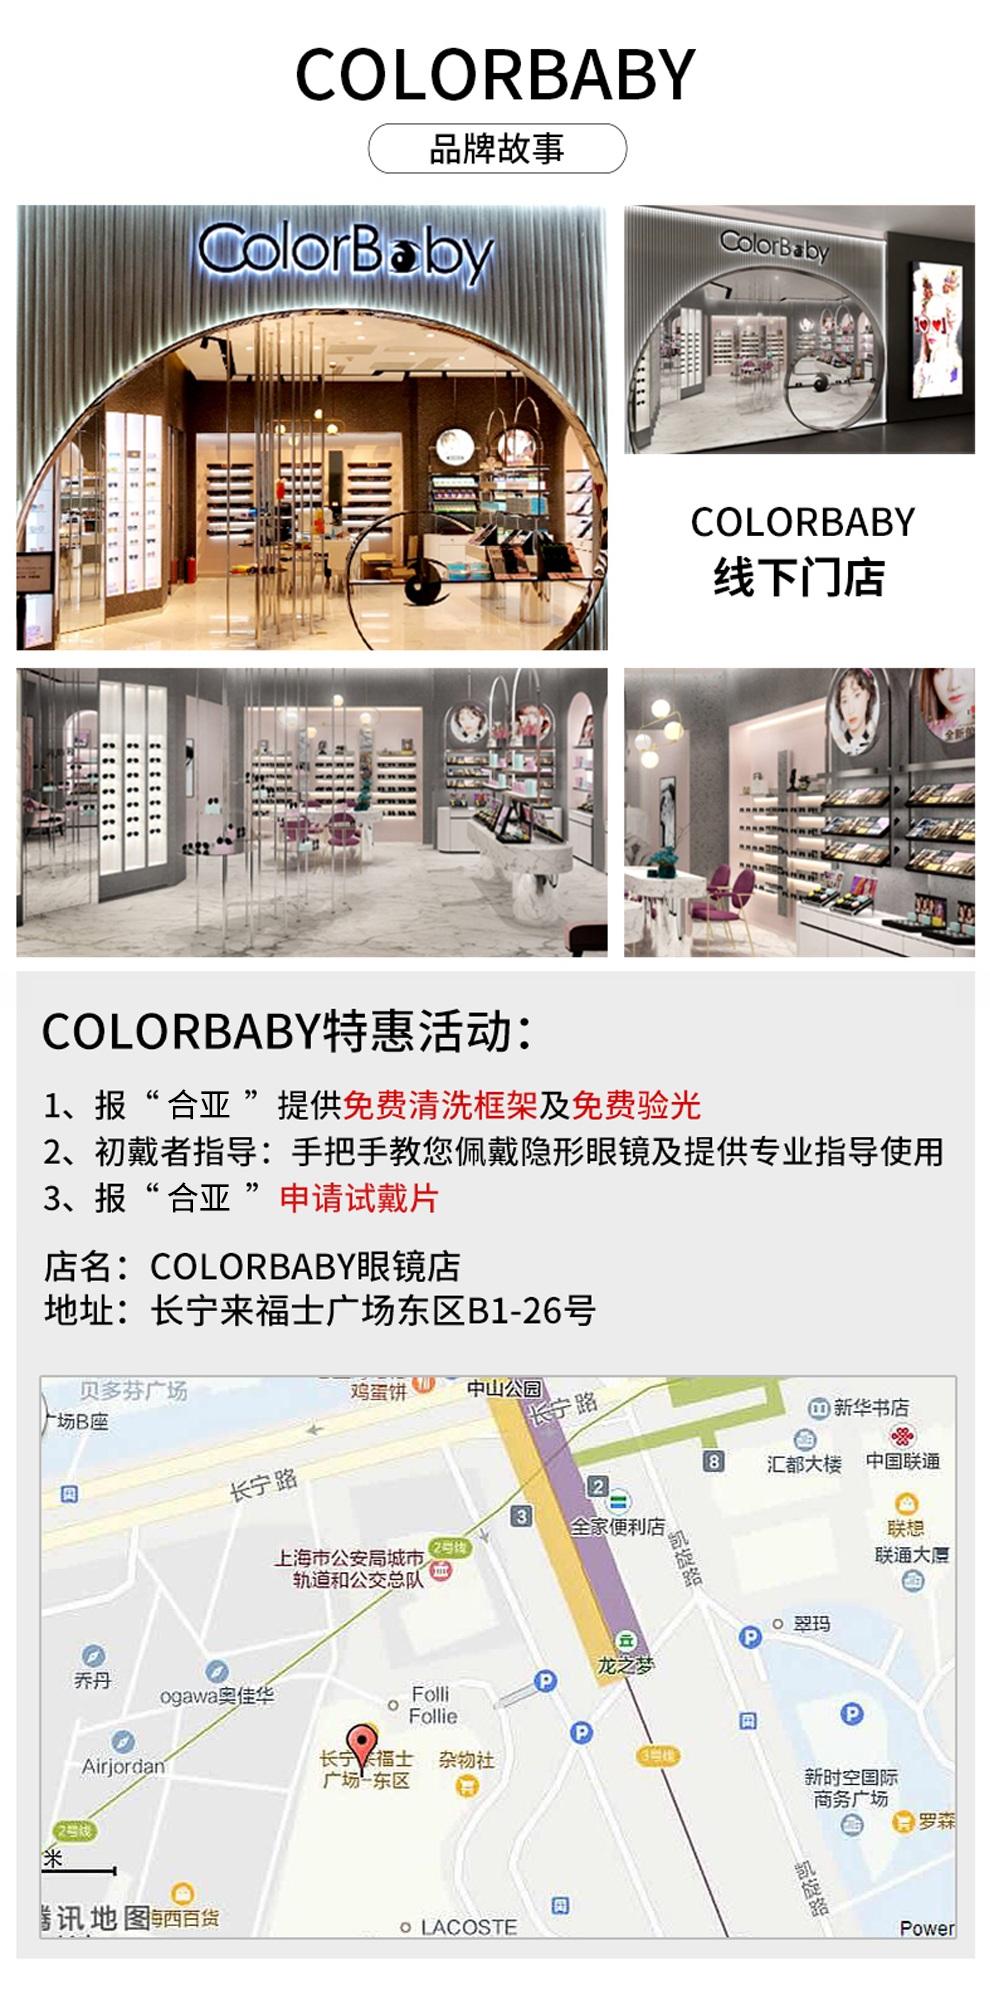 Colorbaby介紹990.jpg